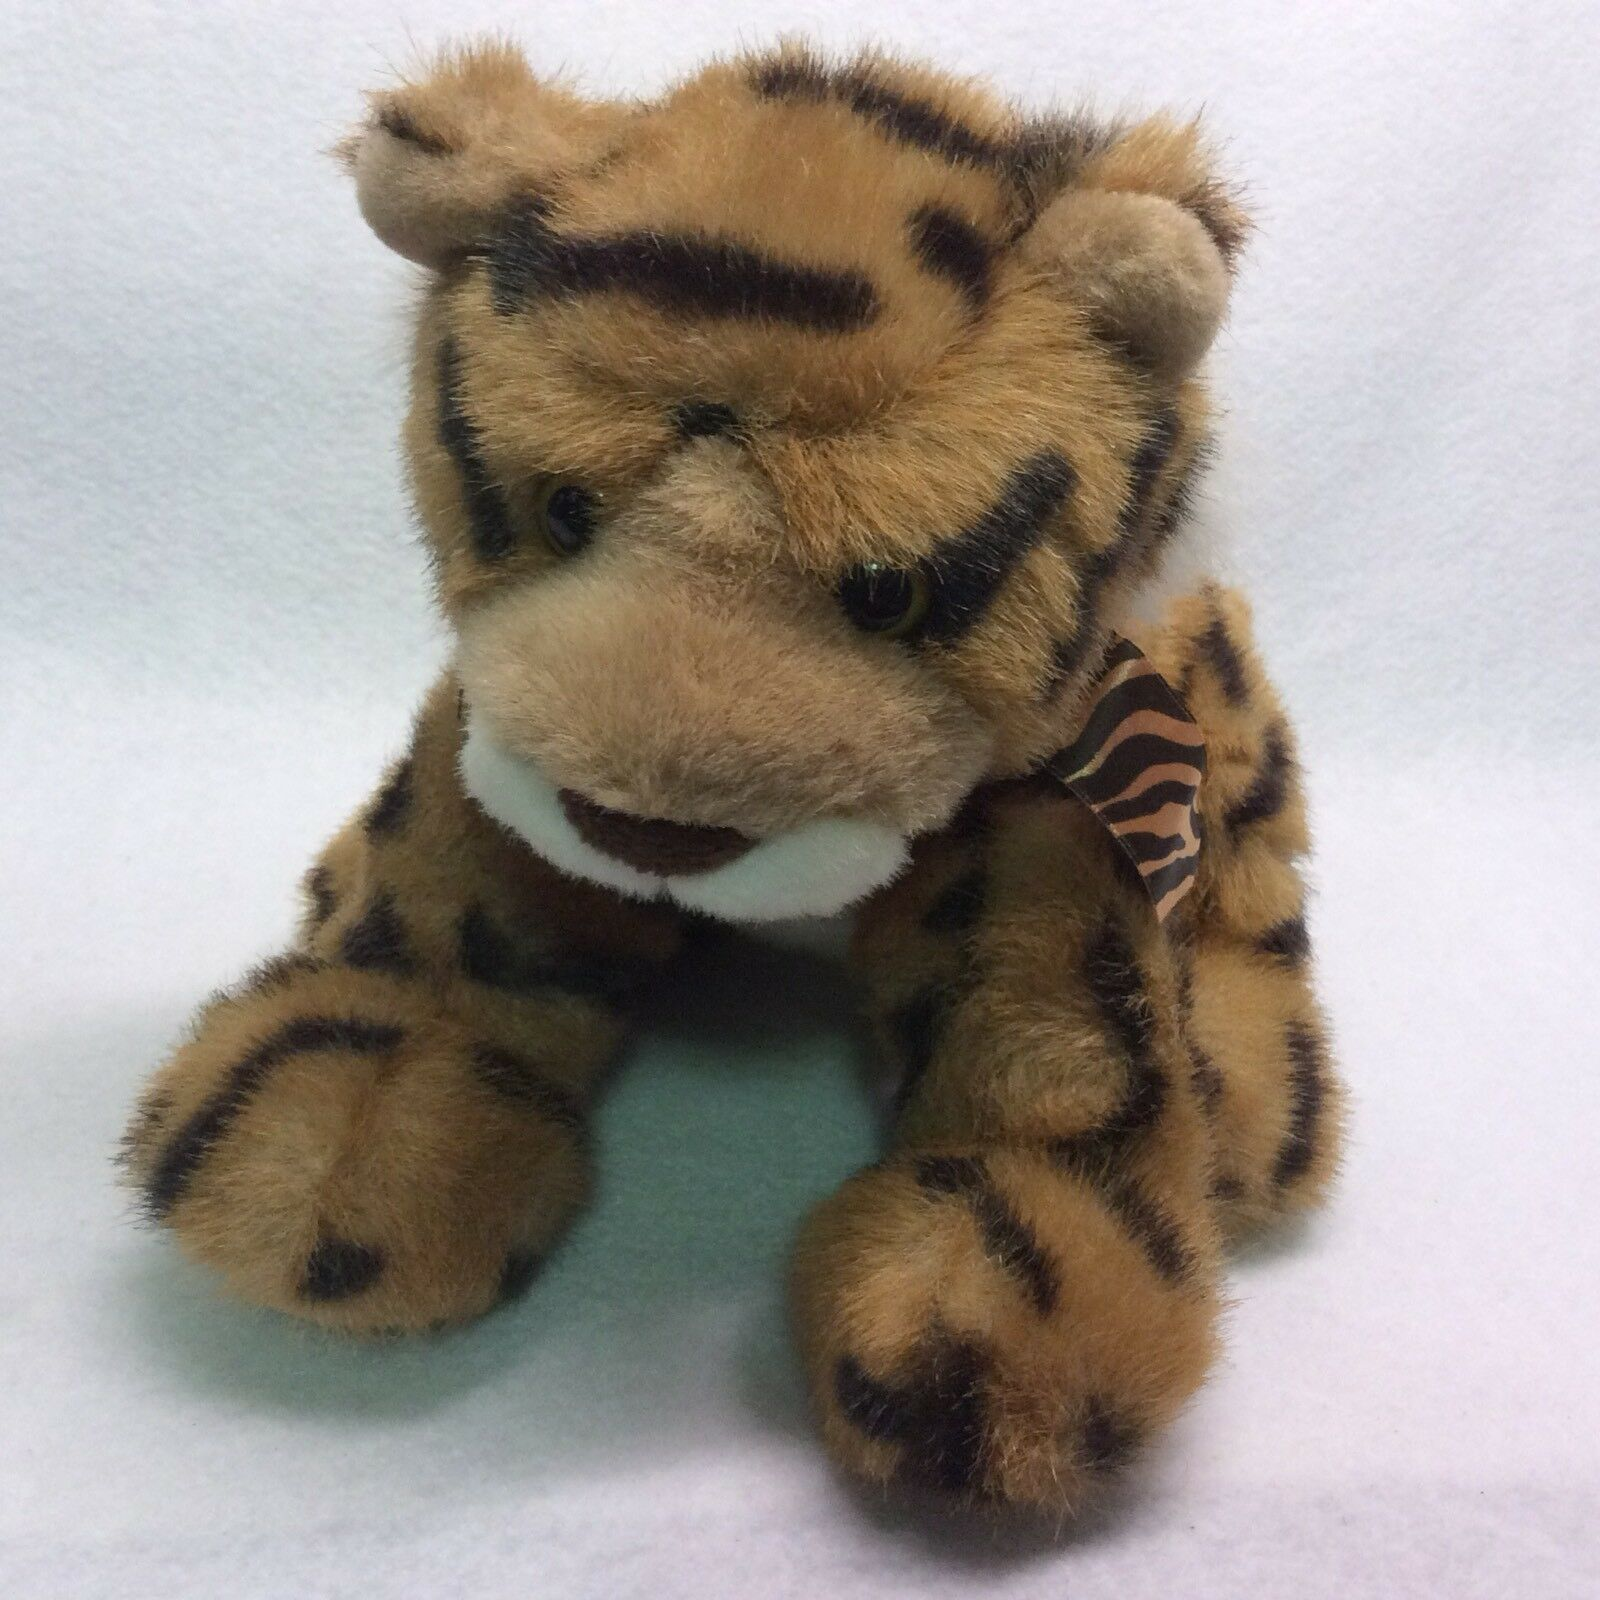 Gund Plush 10  Amani Cheetah - Tiger - Leopard Stuffed Toy Animal - Rare